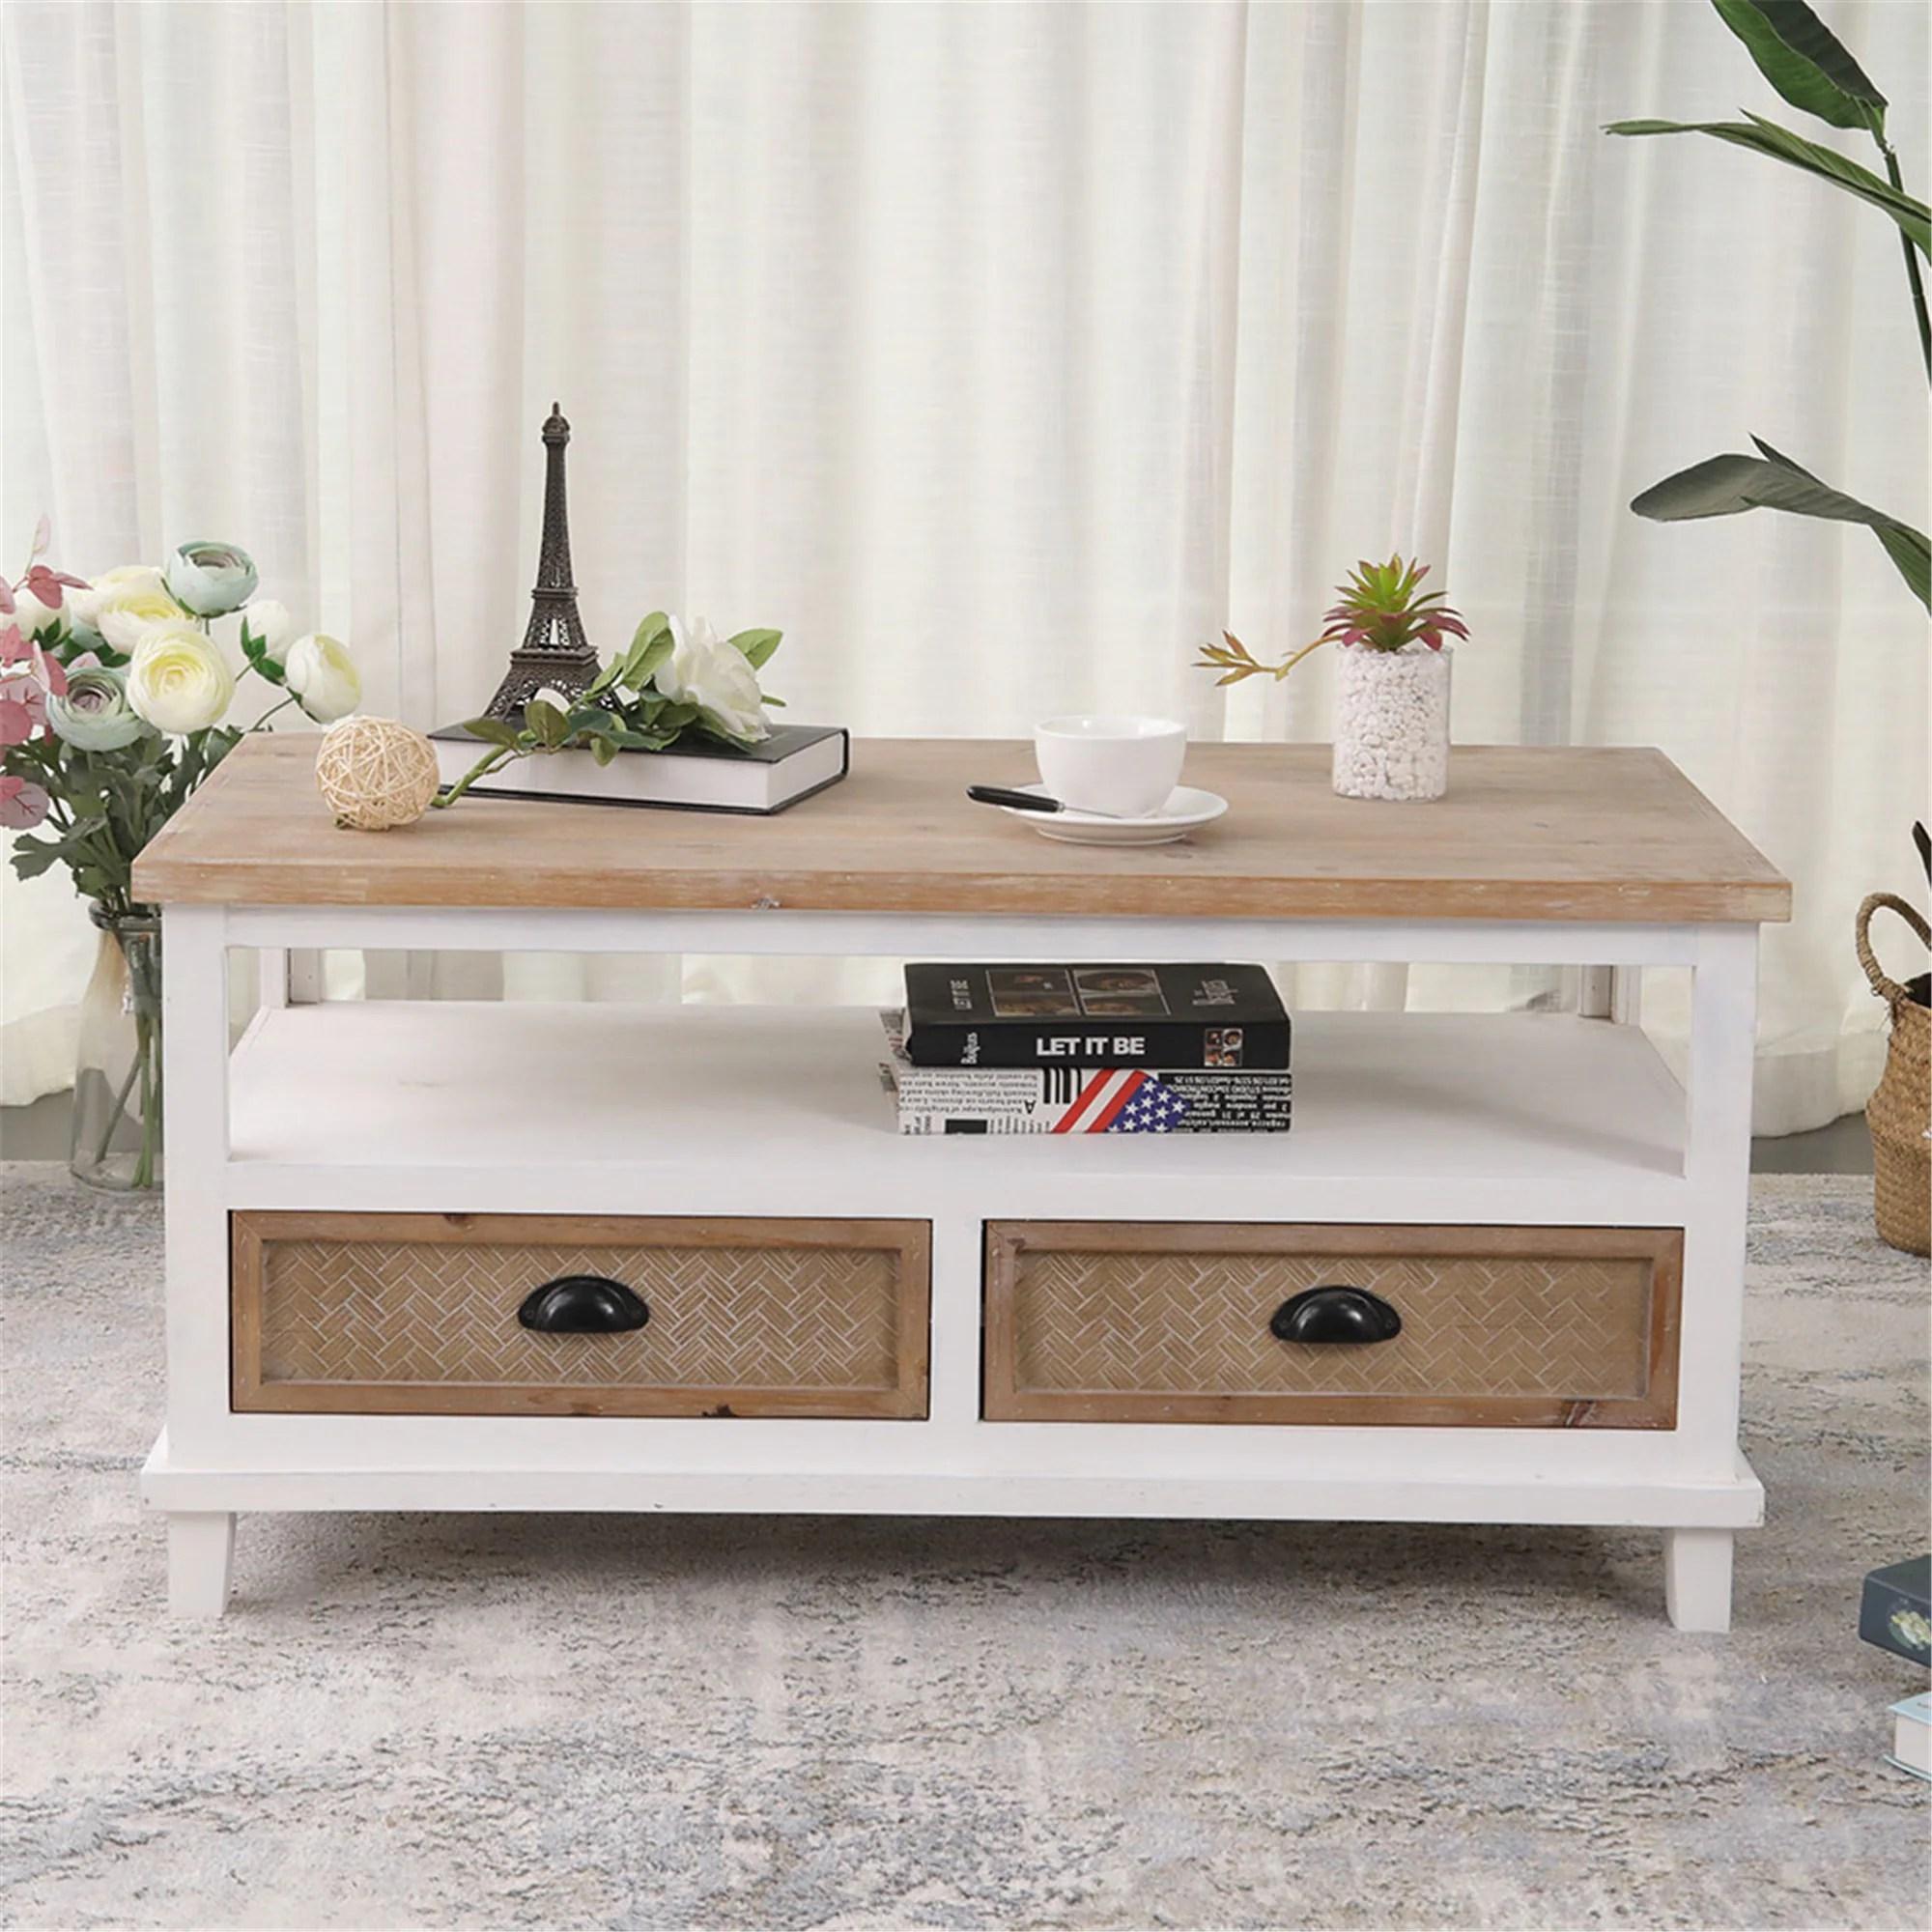 celipu farmhouse white square coffee table with storage